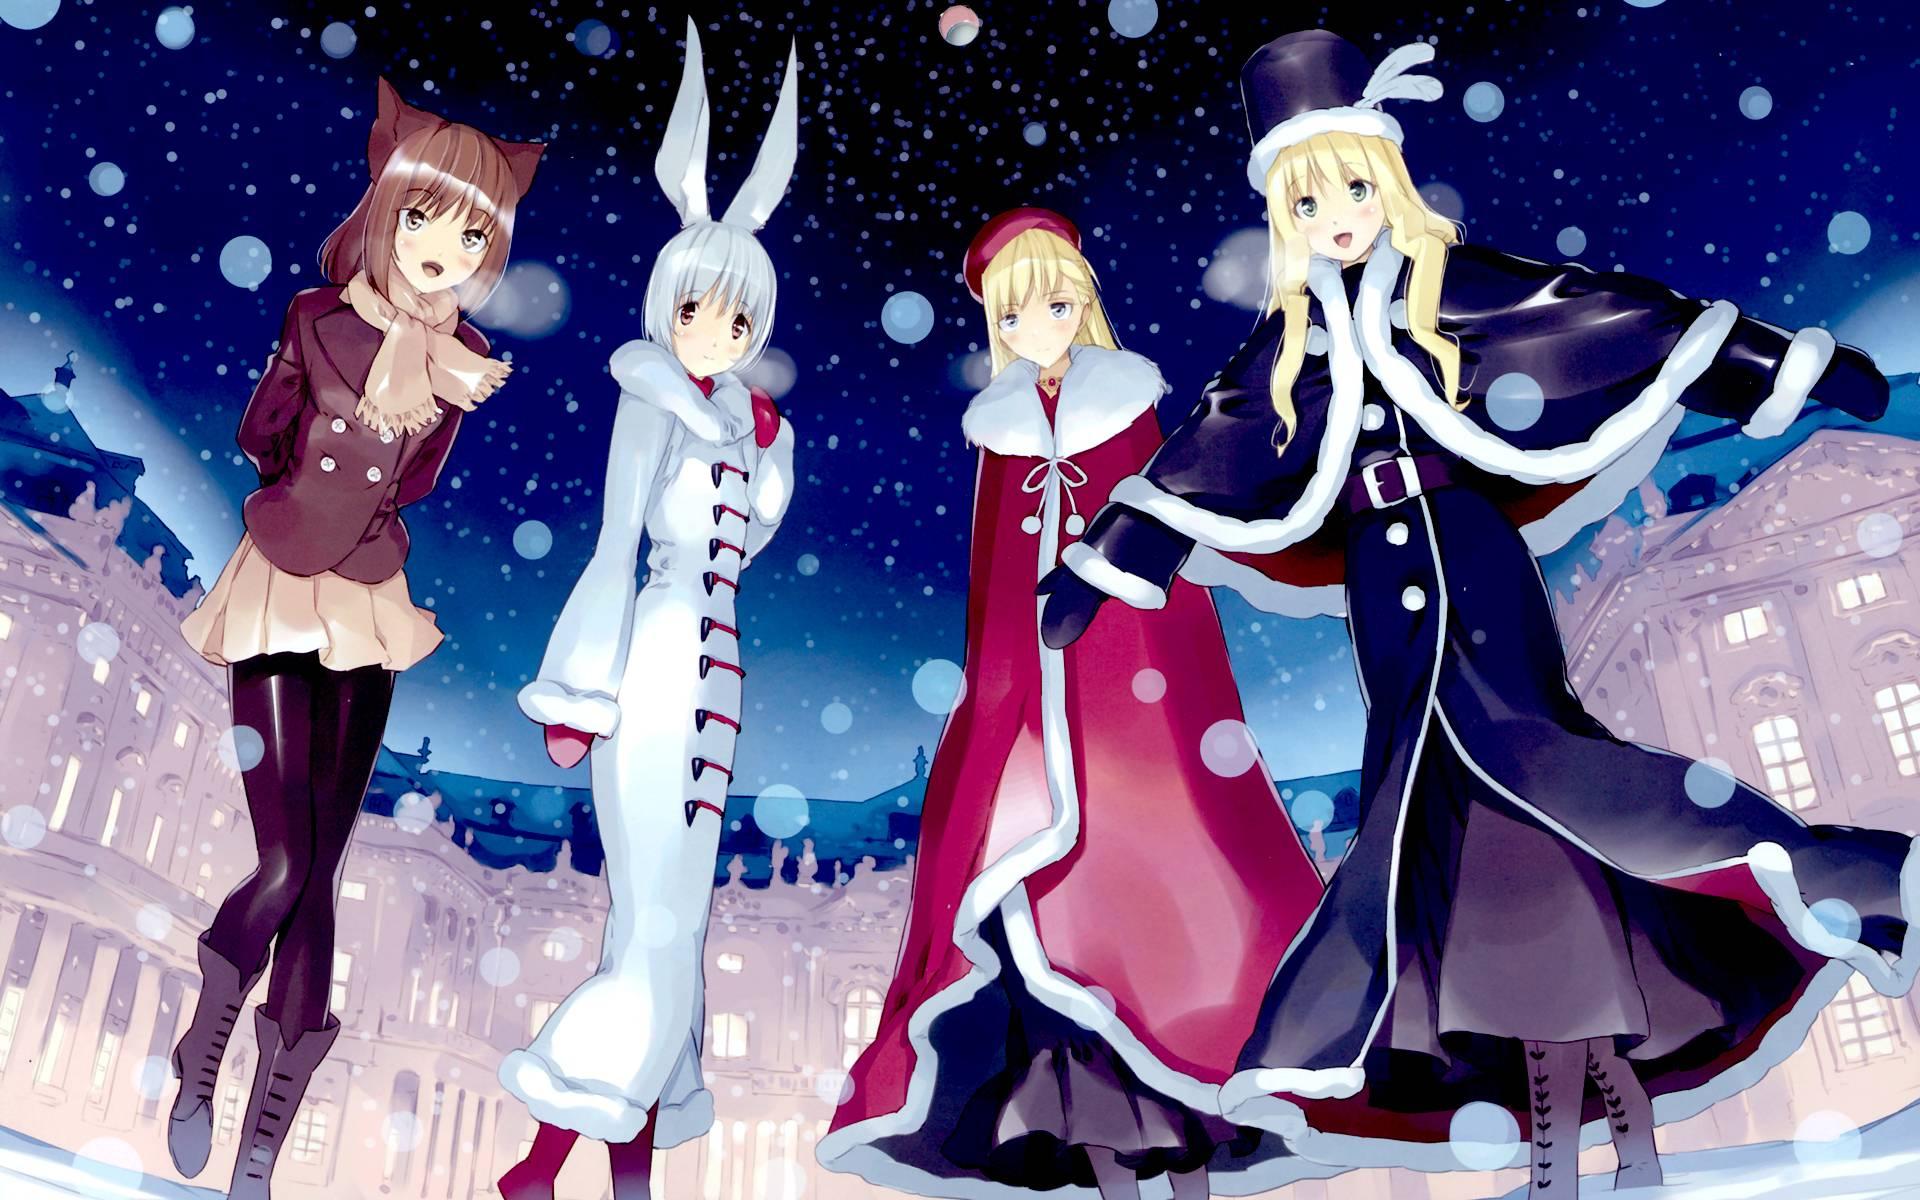 Winter Anime Girl Wallpaper: Anime Fall Wallpapers